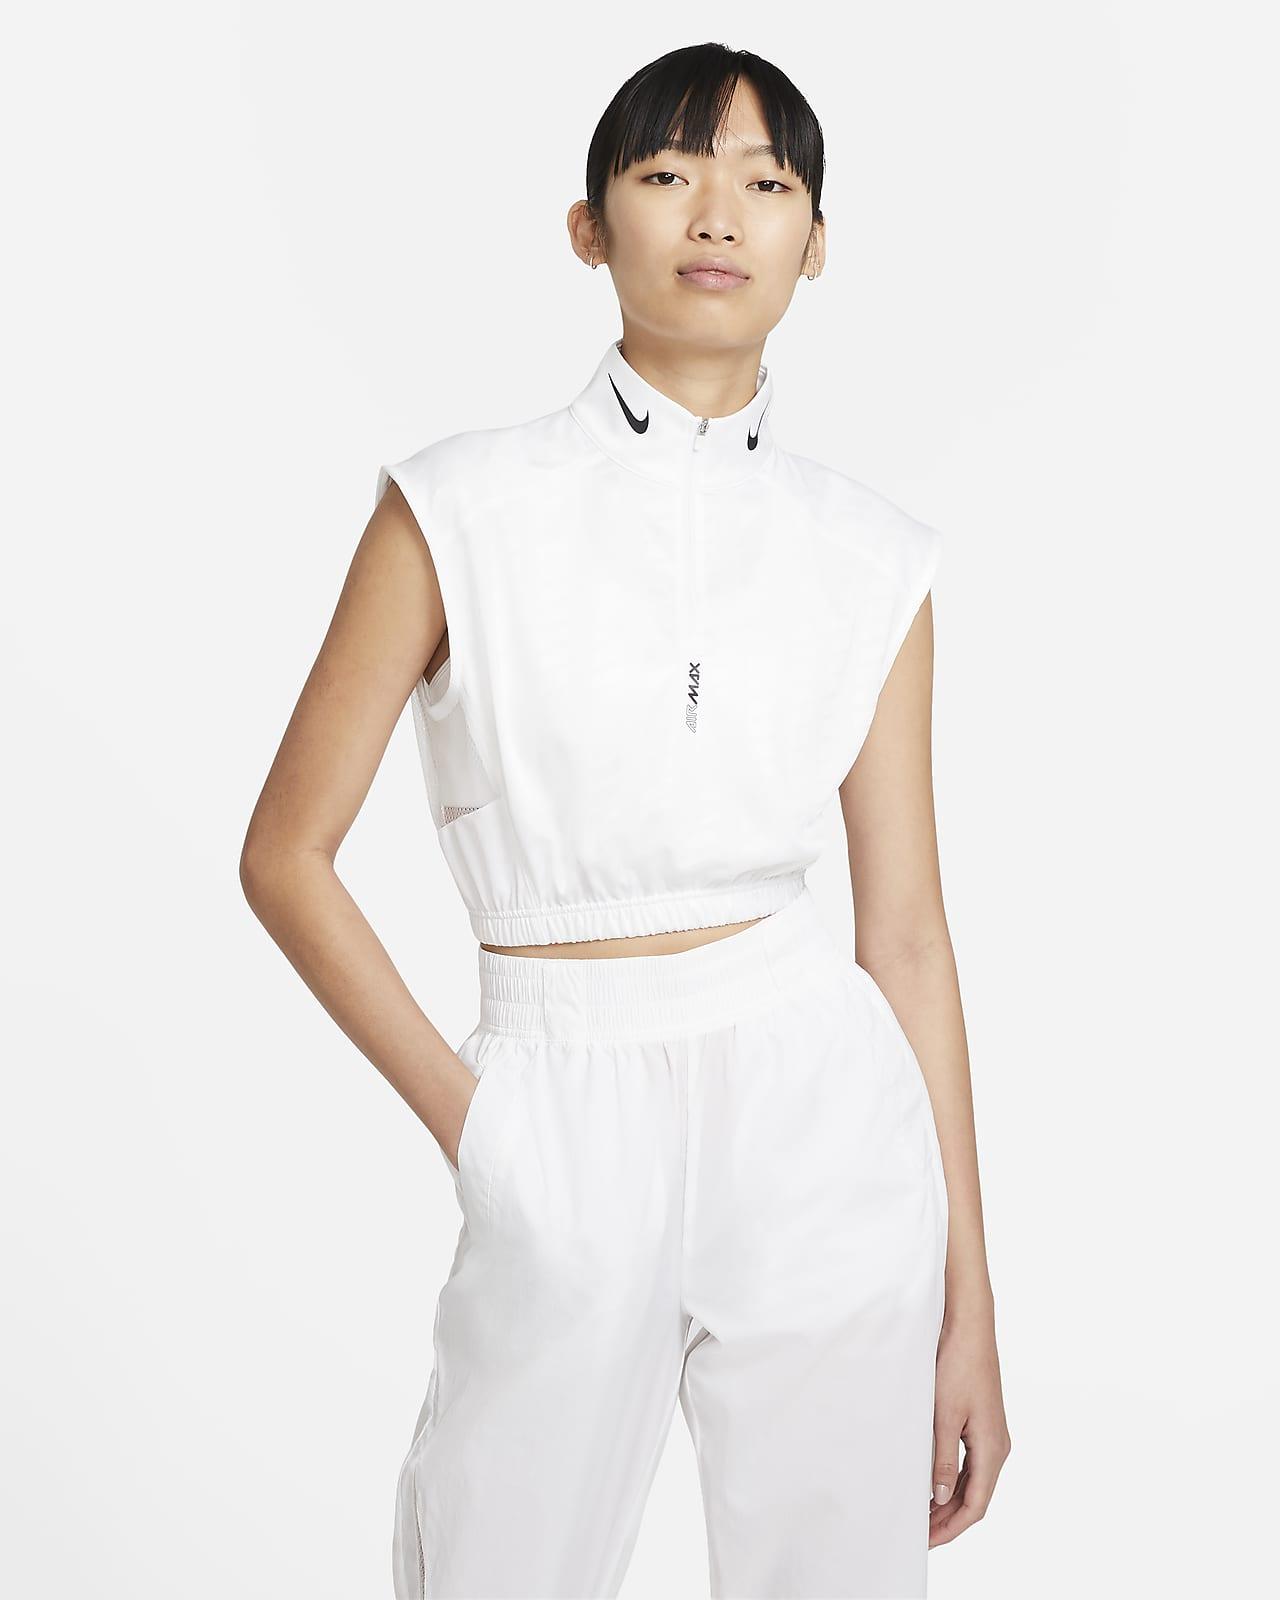 Nike Sportswear 女子半长拉链无袖上衣